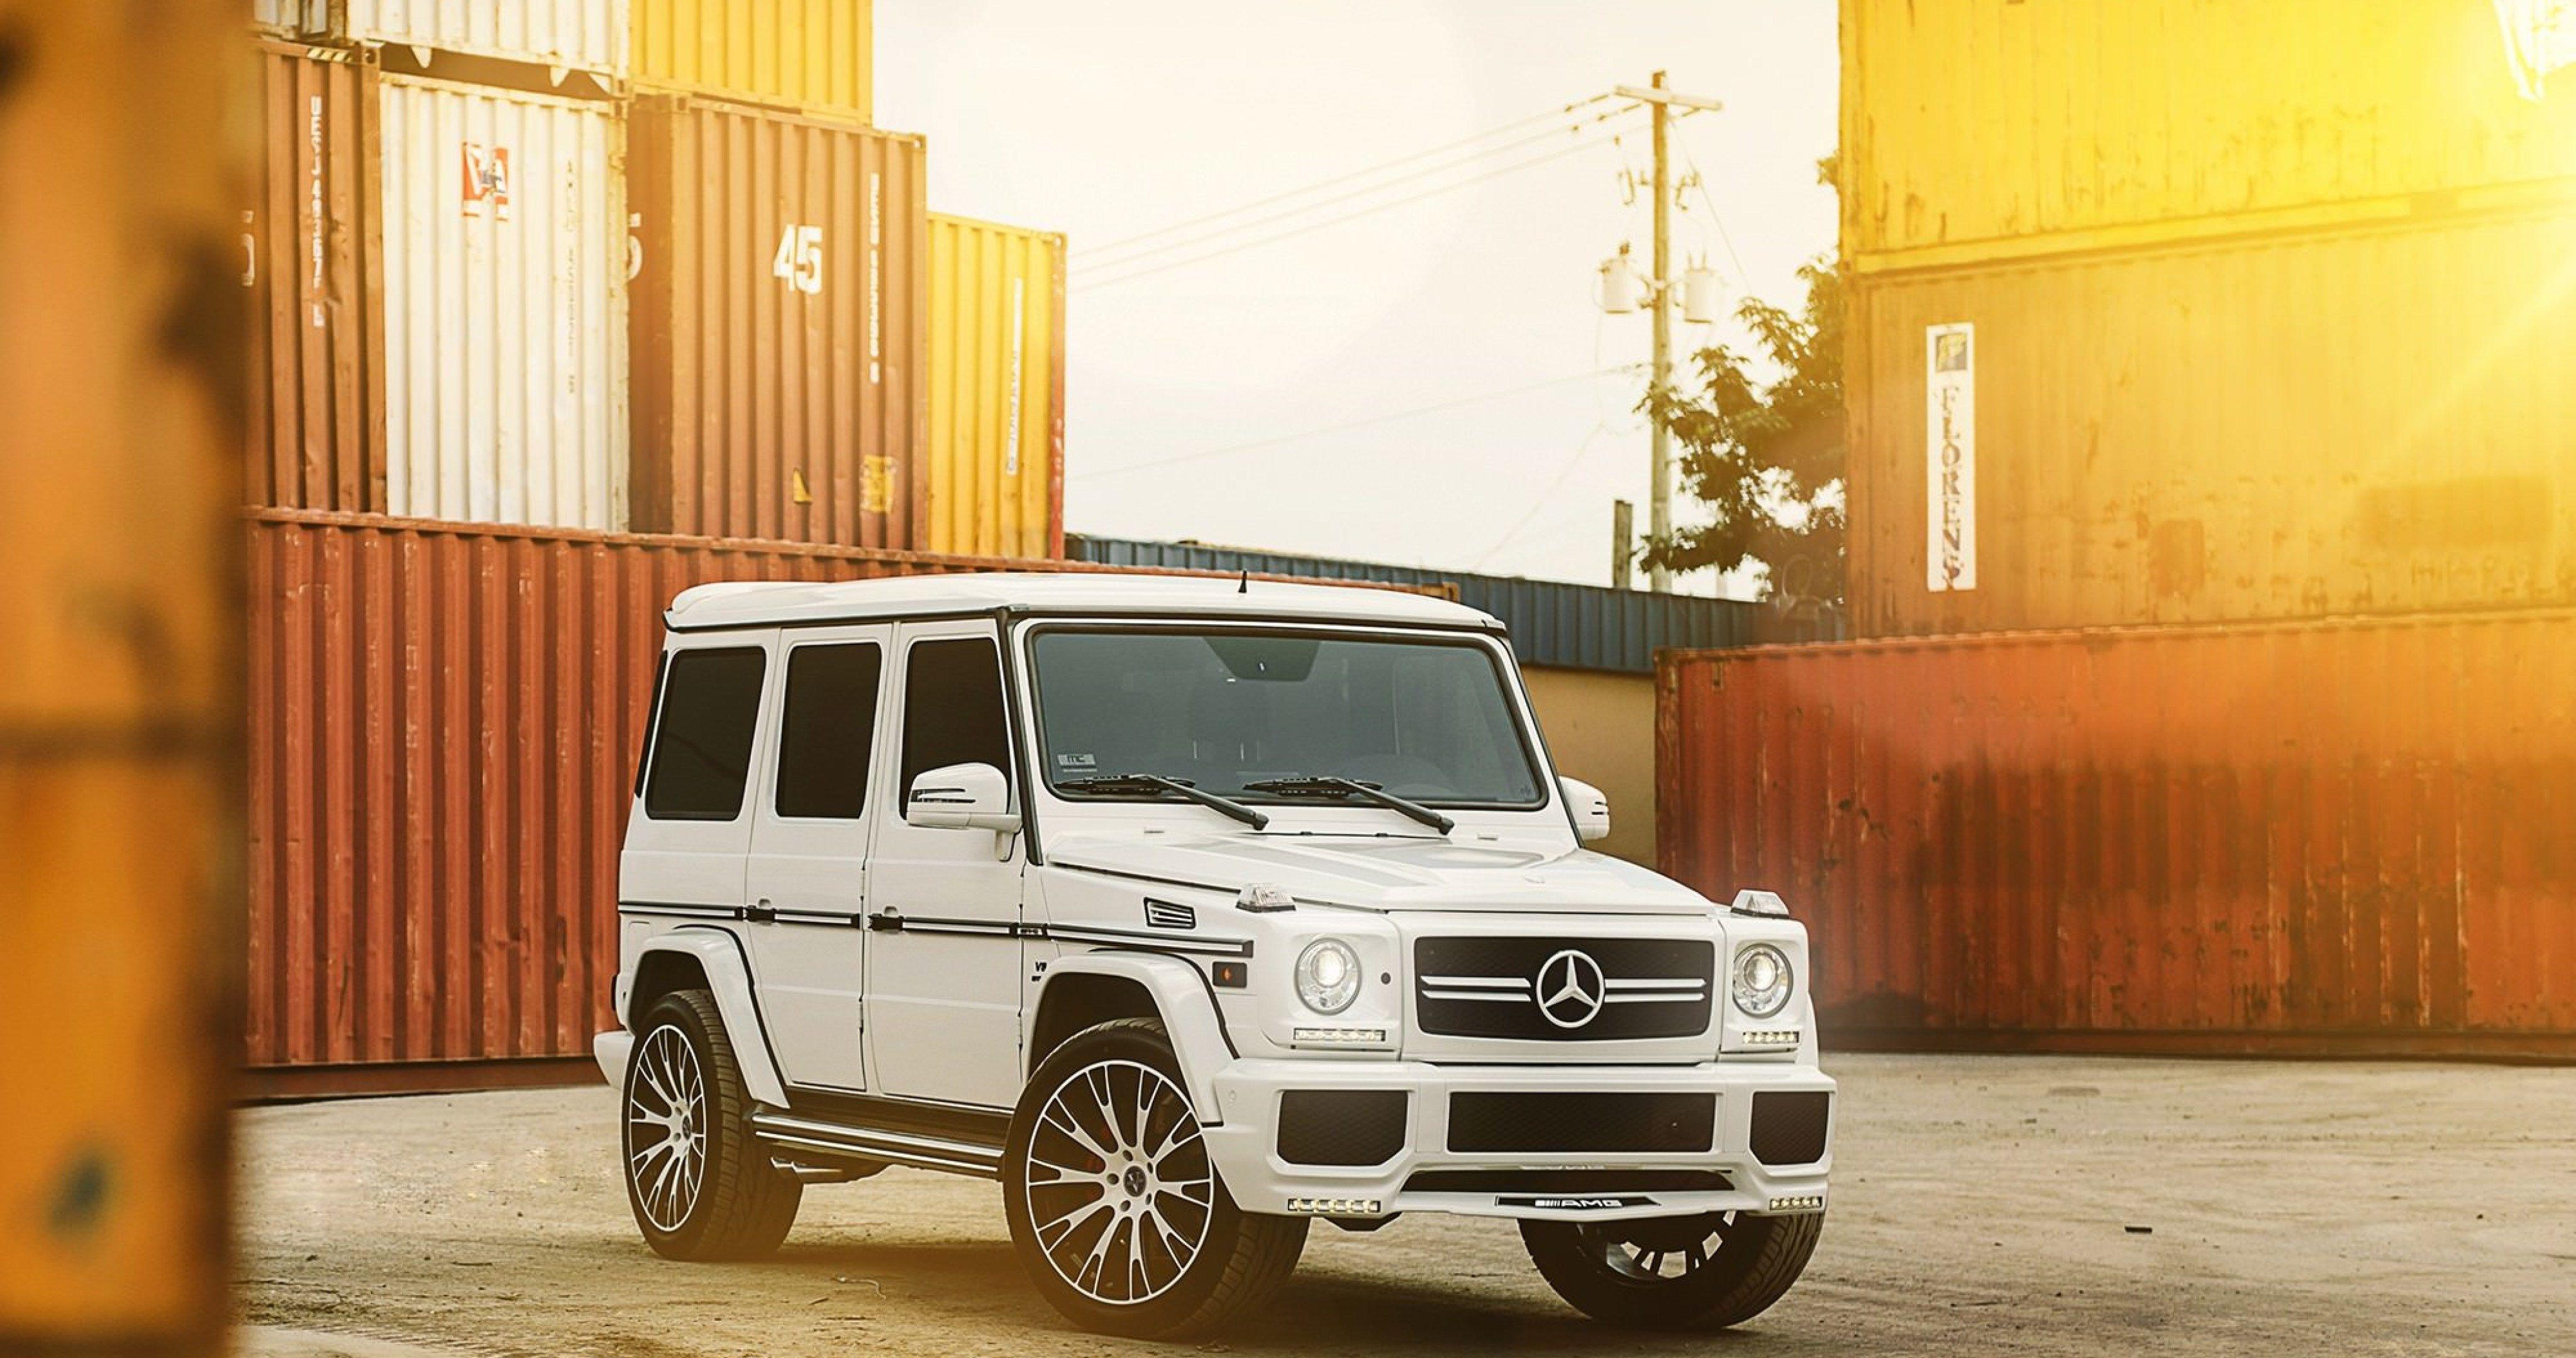 Imposing Wallpaper Brabus 800 Widestar Mercedes Amg G63 2019